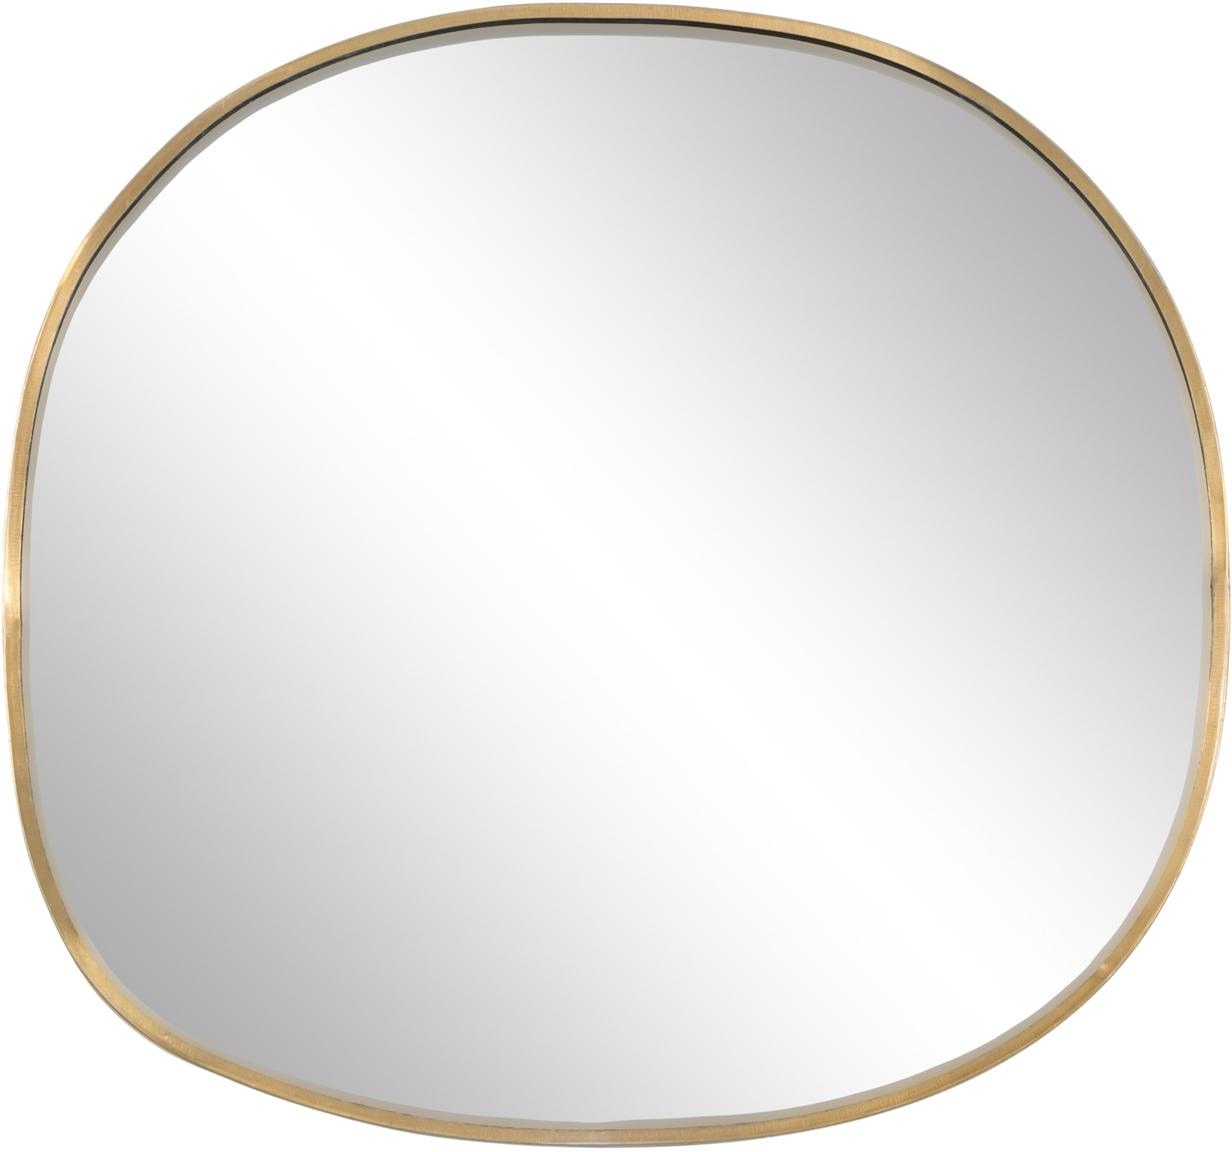 Espejo de pared Daily Pretty, Espejo: cristal, Latón, An 27 x Al 25 cm